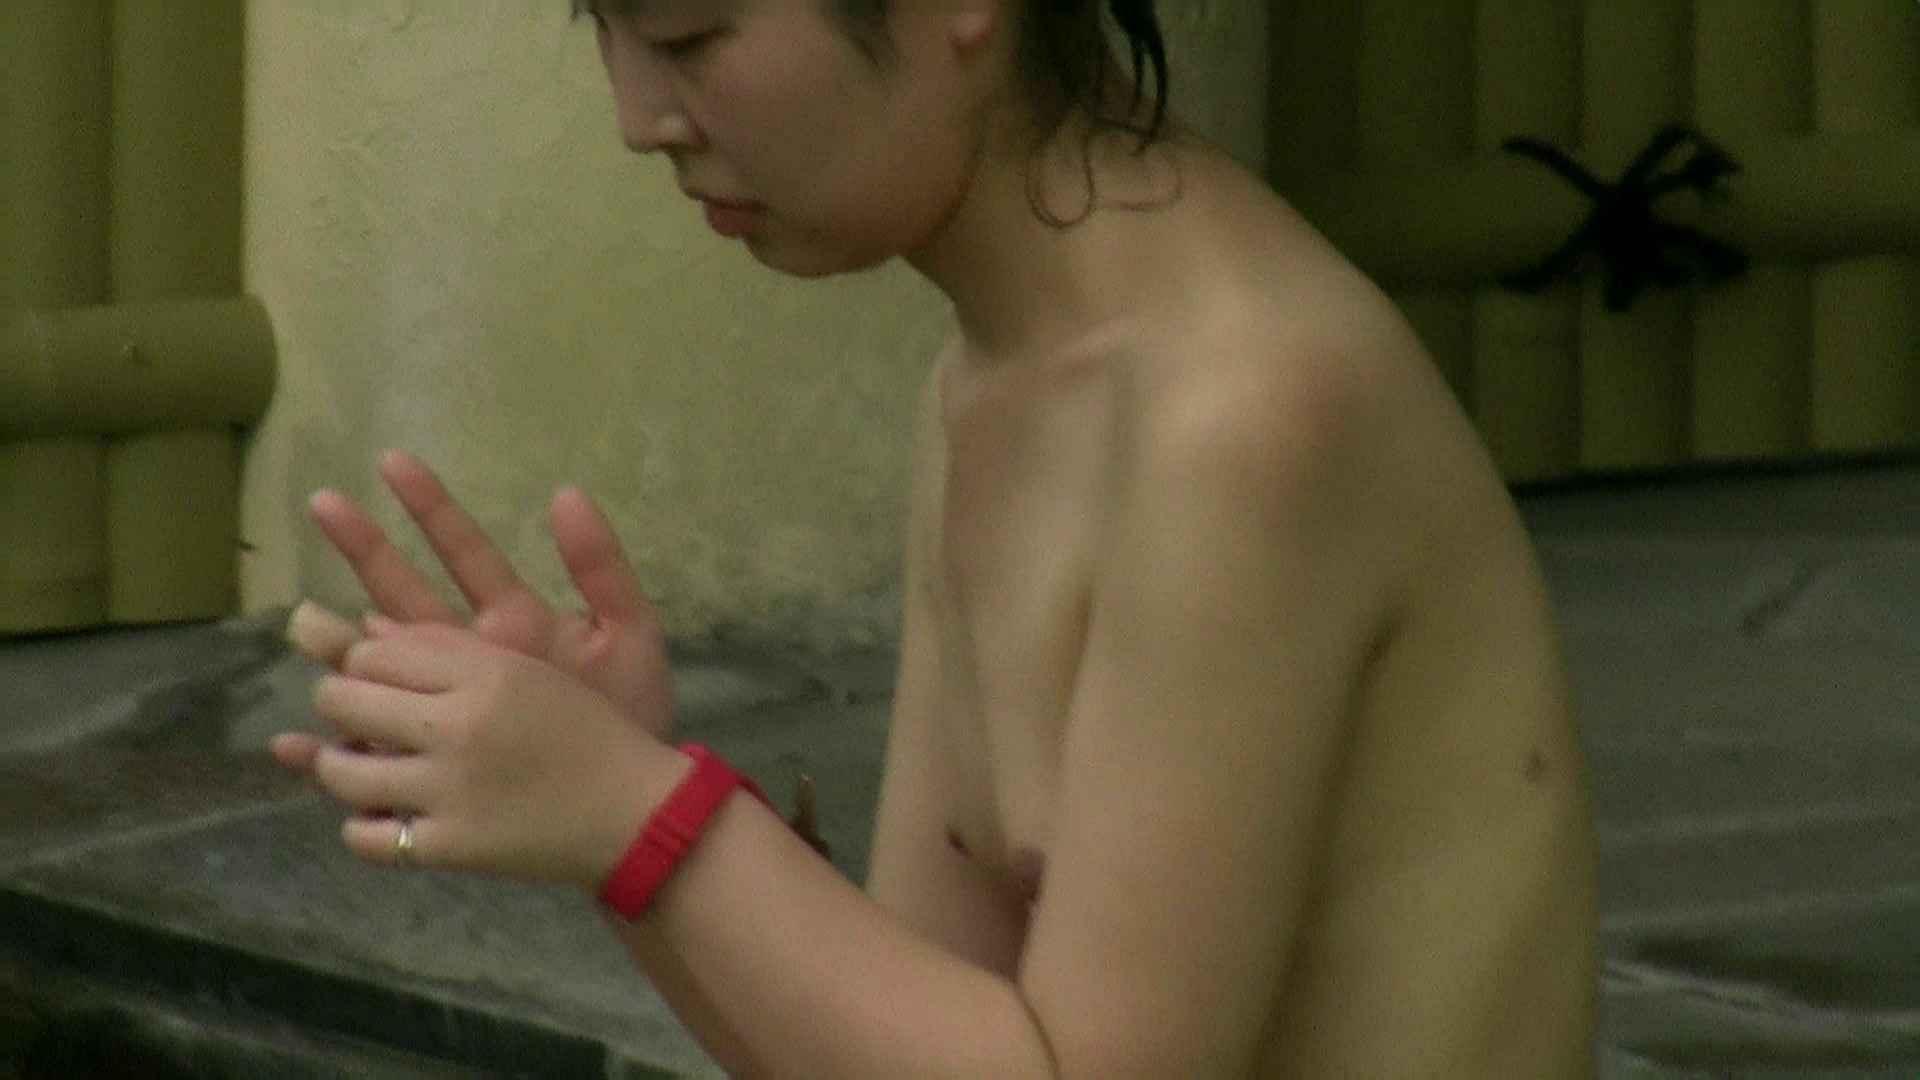 Aquaな露天風呂Vol.636 OL女体 | 露天  87連発 61